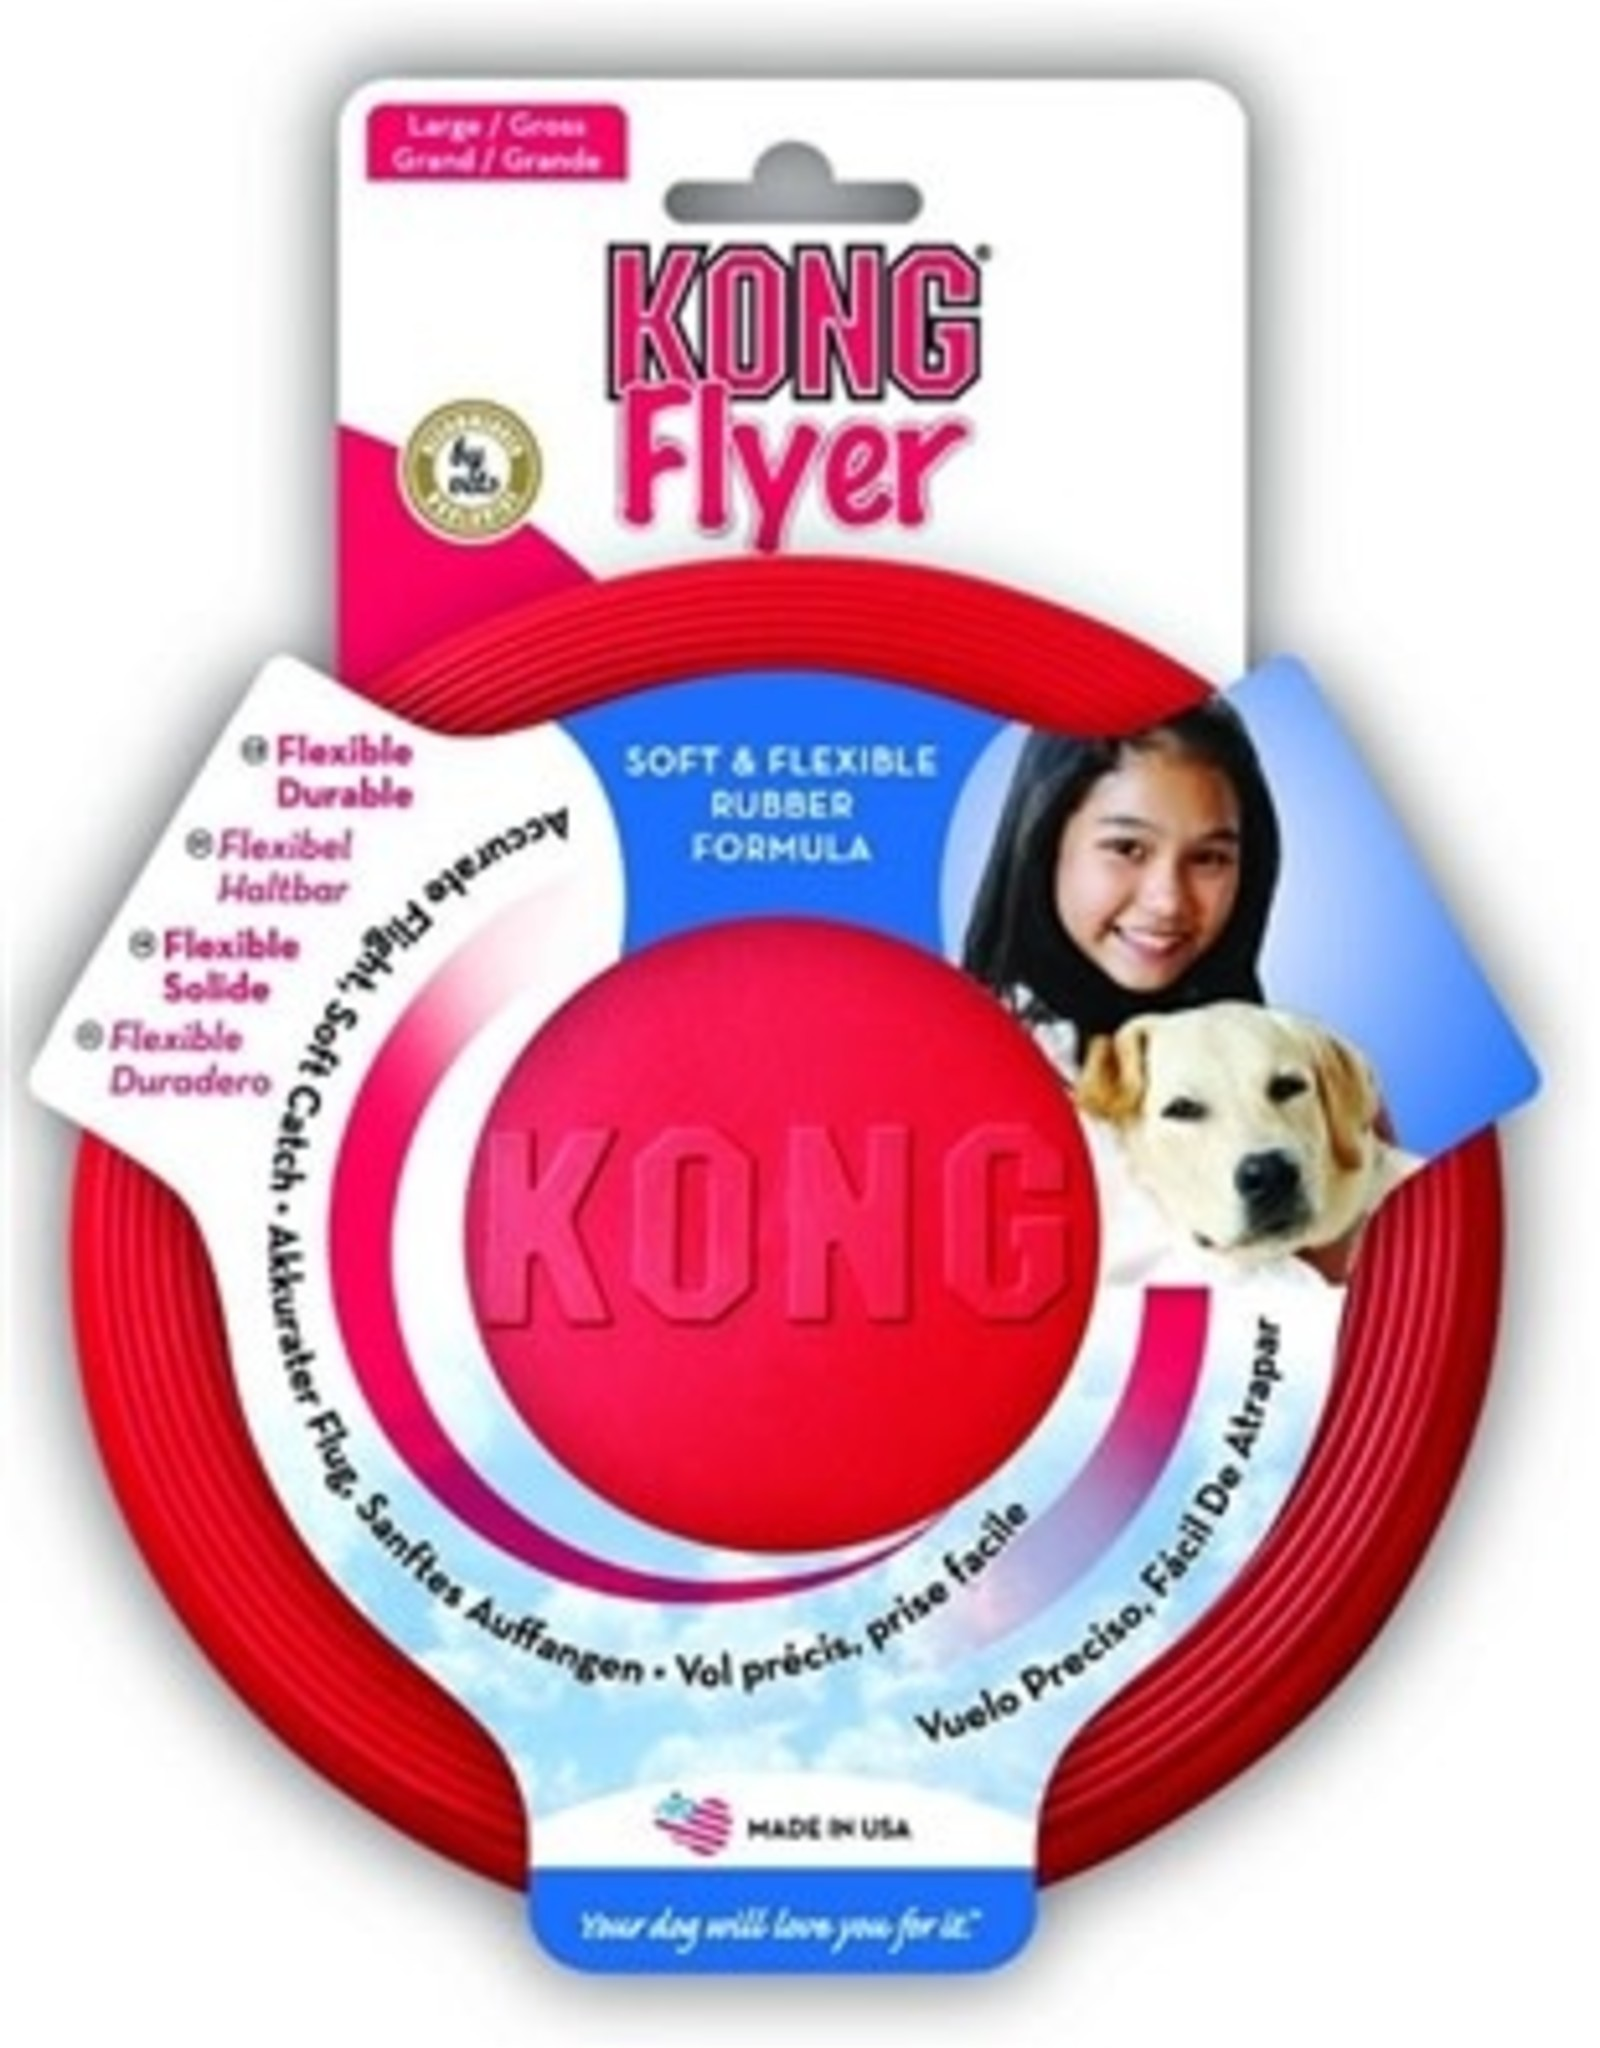 Kong Flyer LG